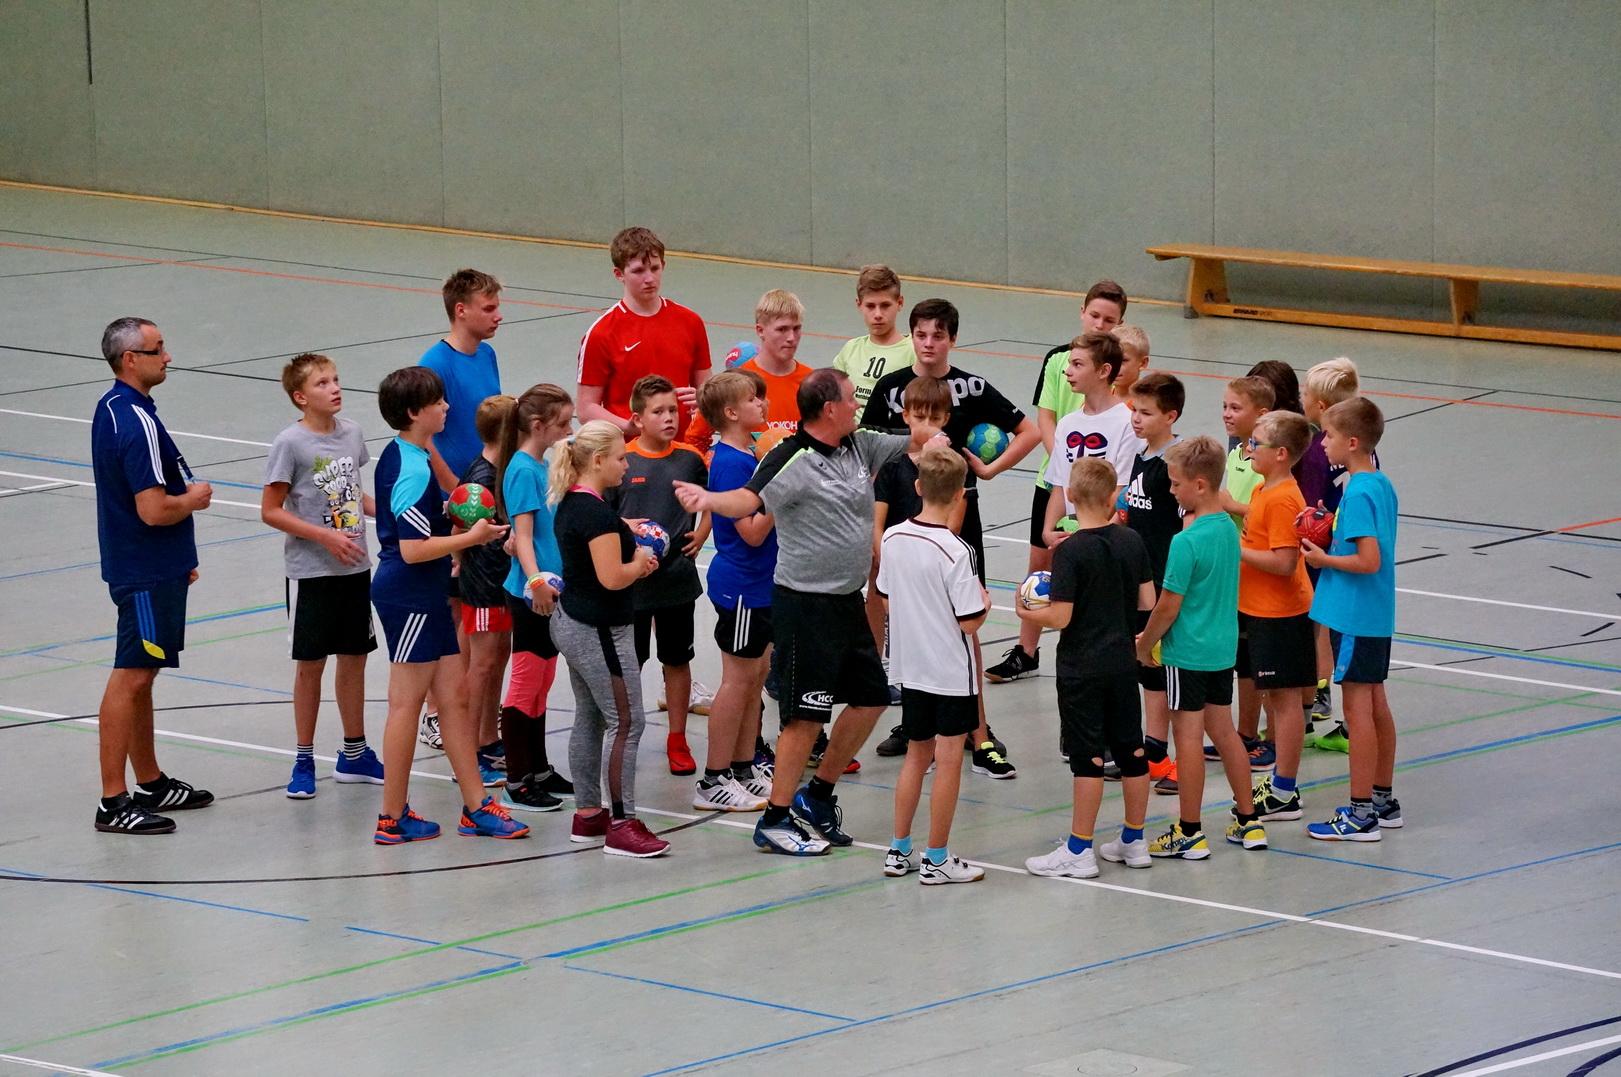 201808_Handballcamp_SDH_MG_084w